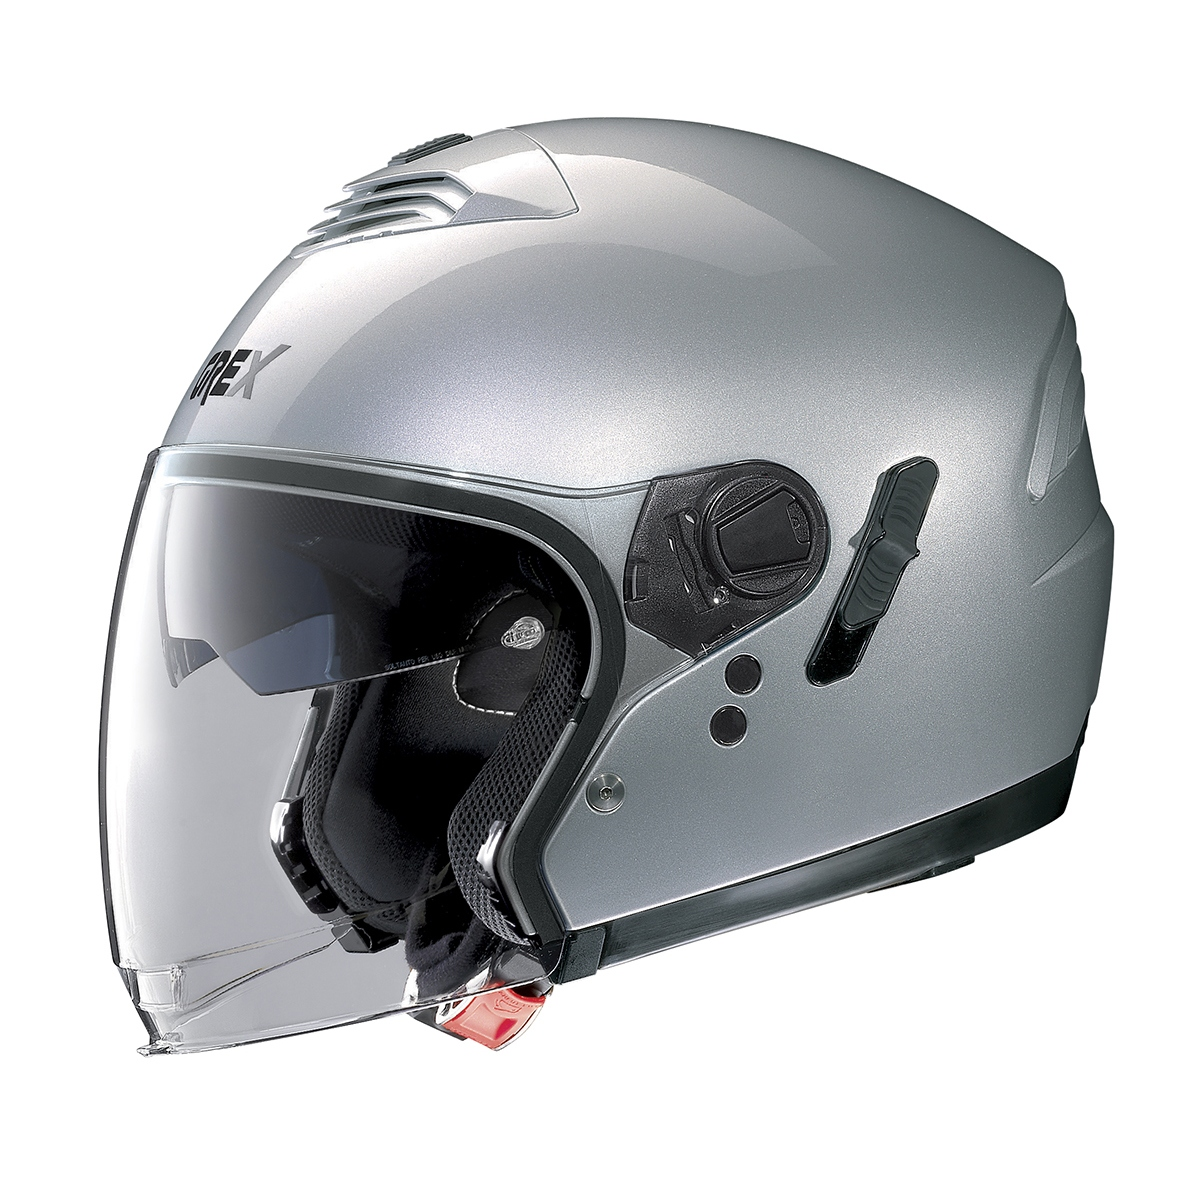 Moto helma Grex G4.1E Kinetic Silver 3